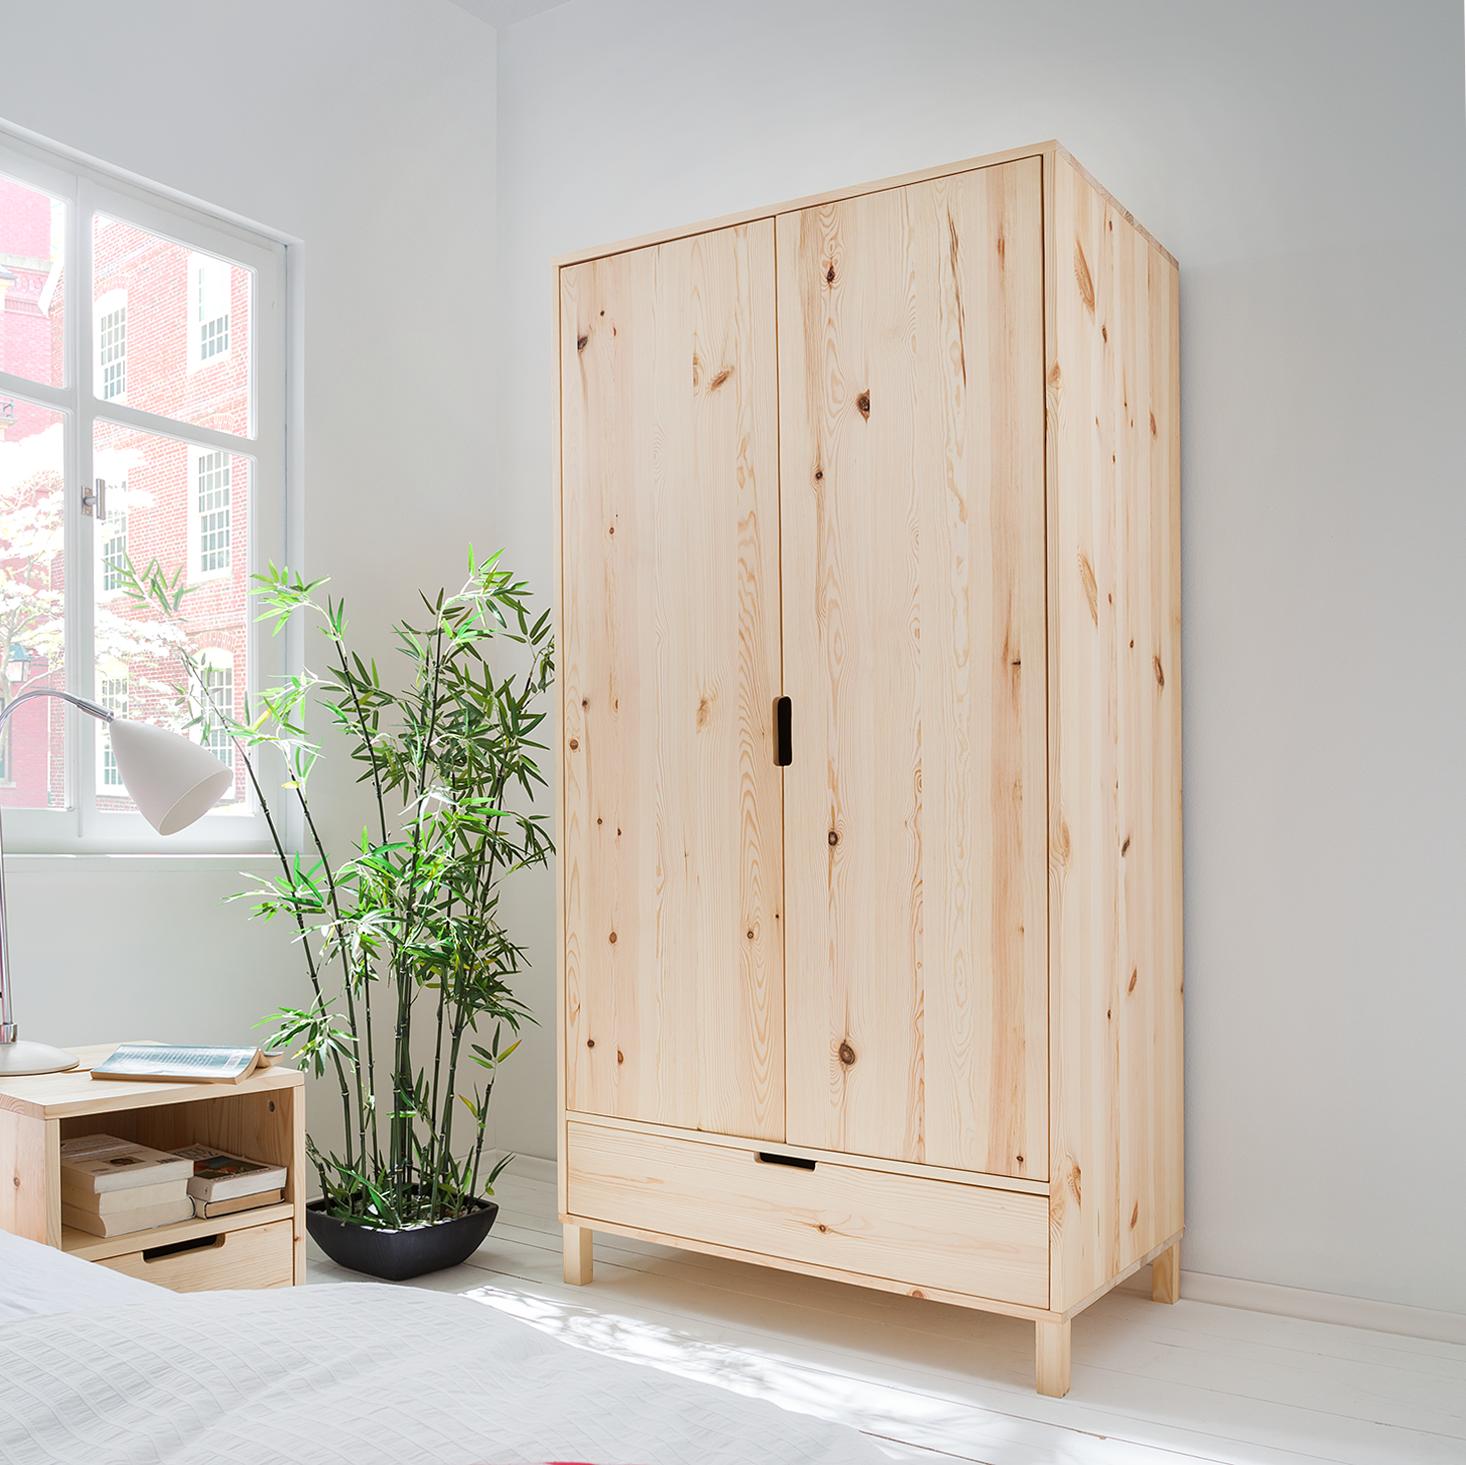 kleiderschrank kiydoo wood kiefer massiv schlafzimmer ebay. Black Bedroom Furniture Sets. Home Design Ideas